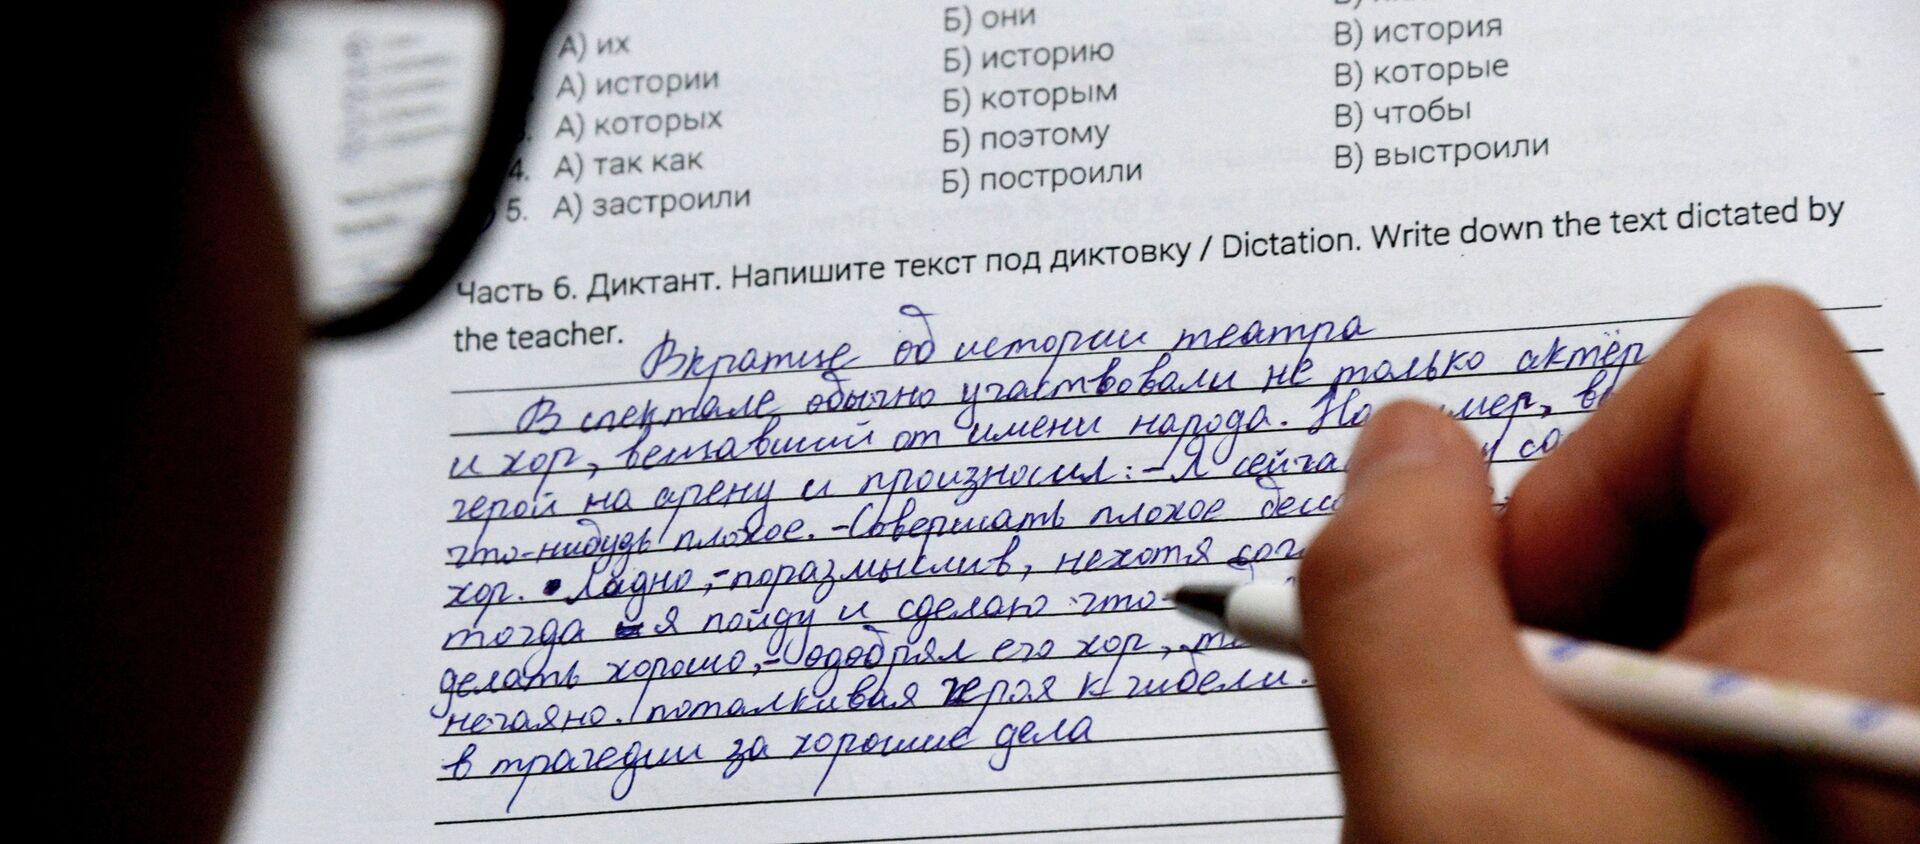 El idioma ruso (archivo) - Sputnik Mundo, 1920, 26.01.2021